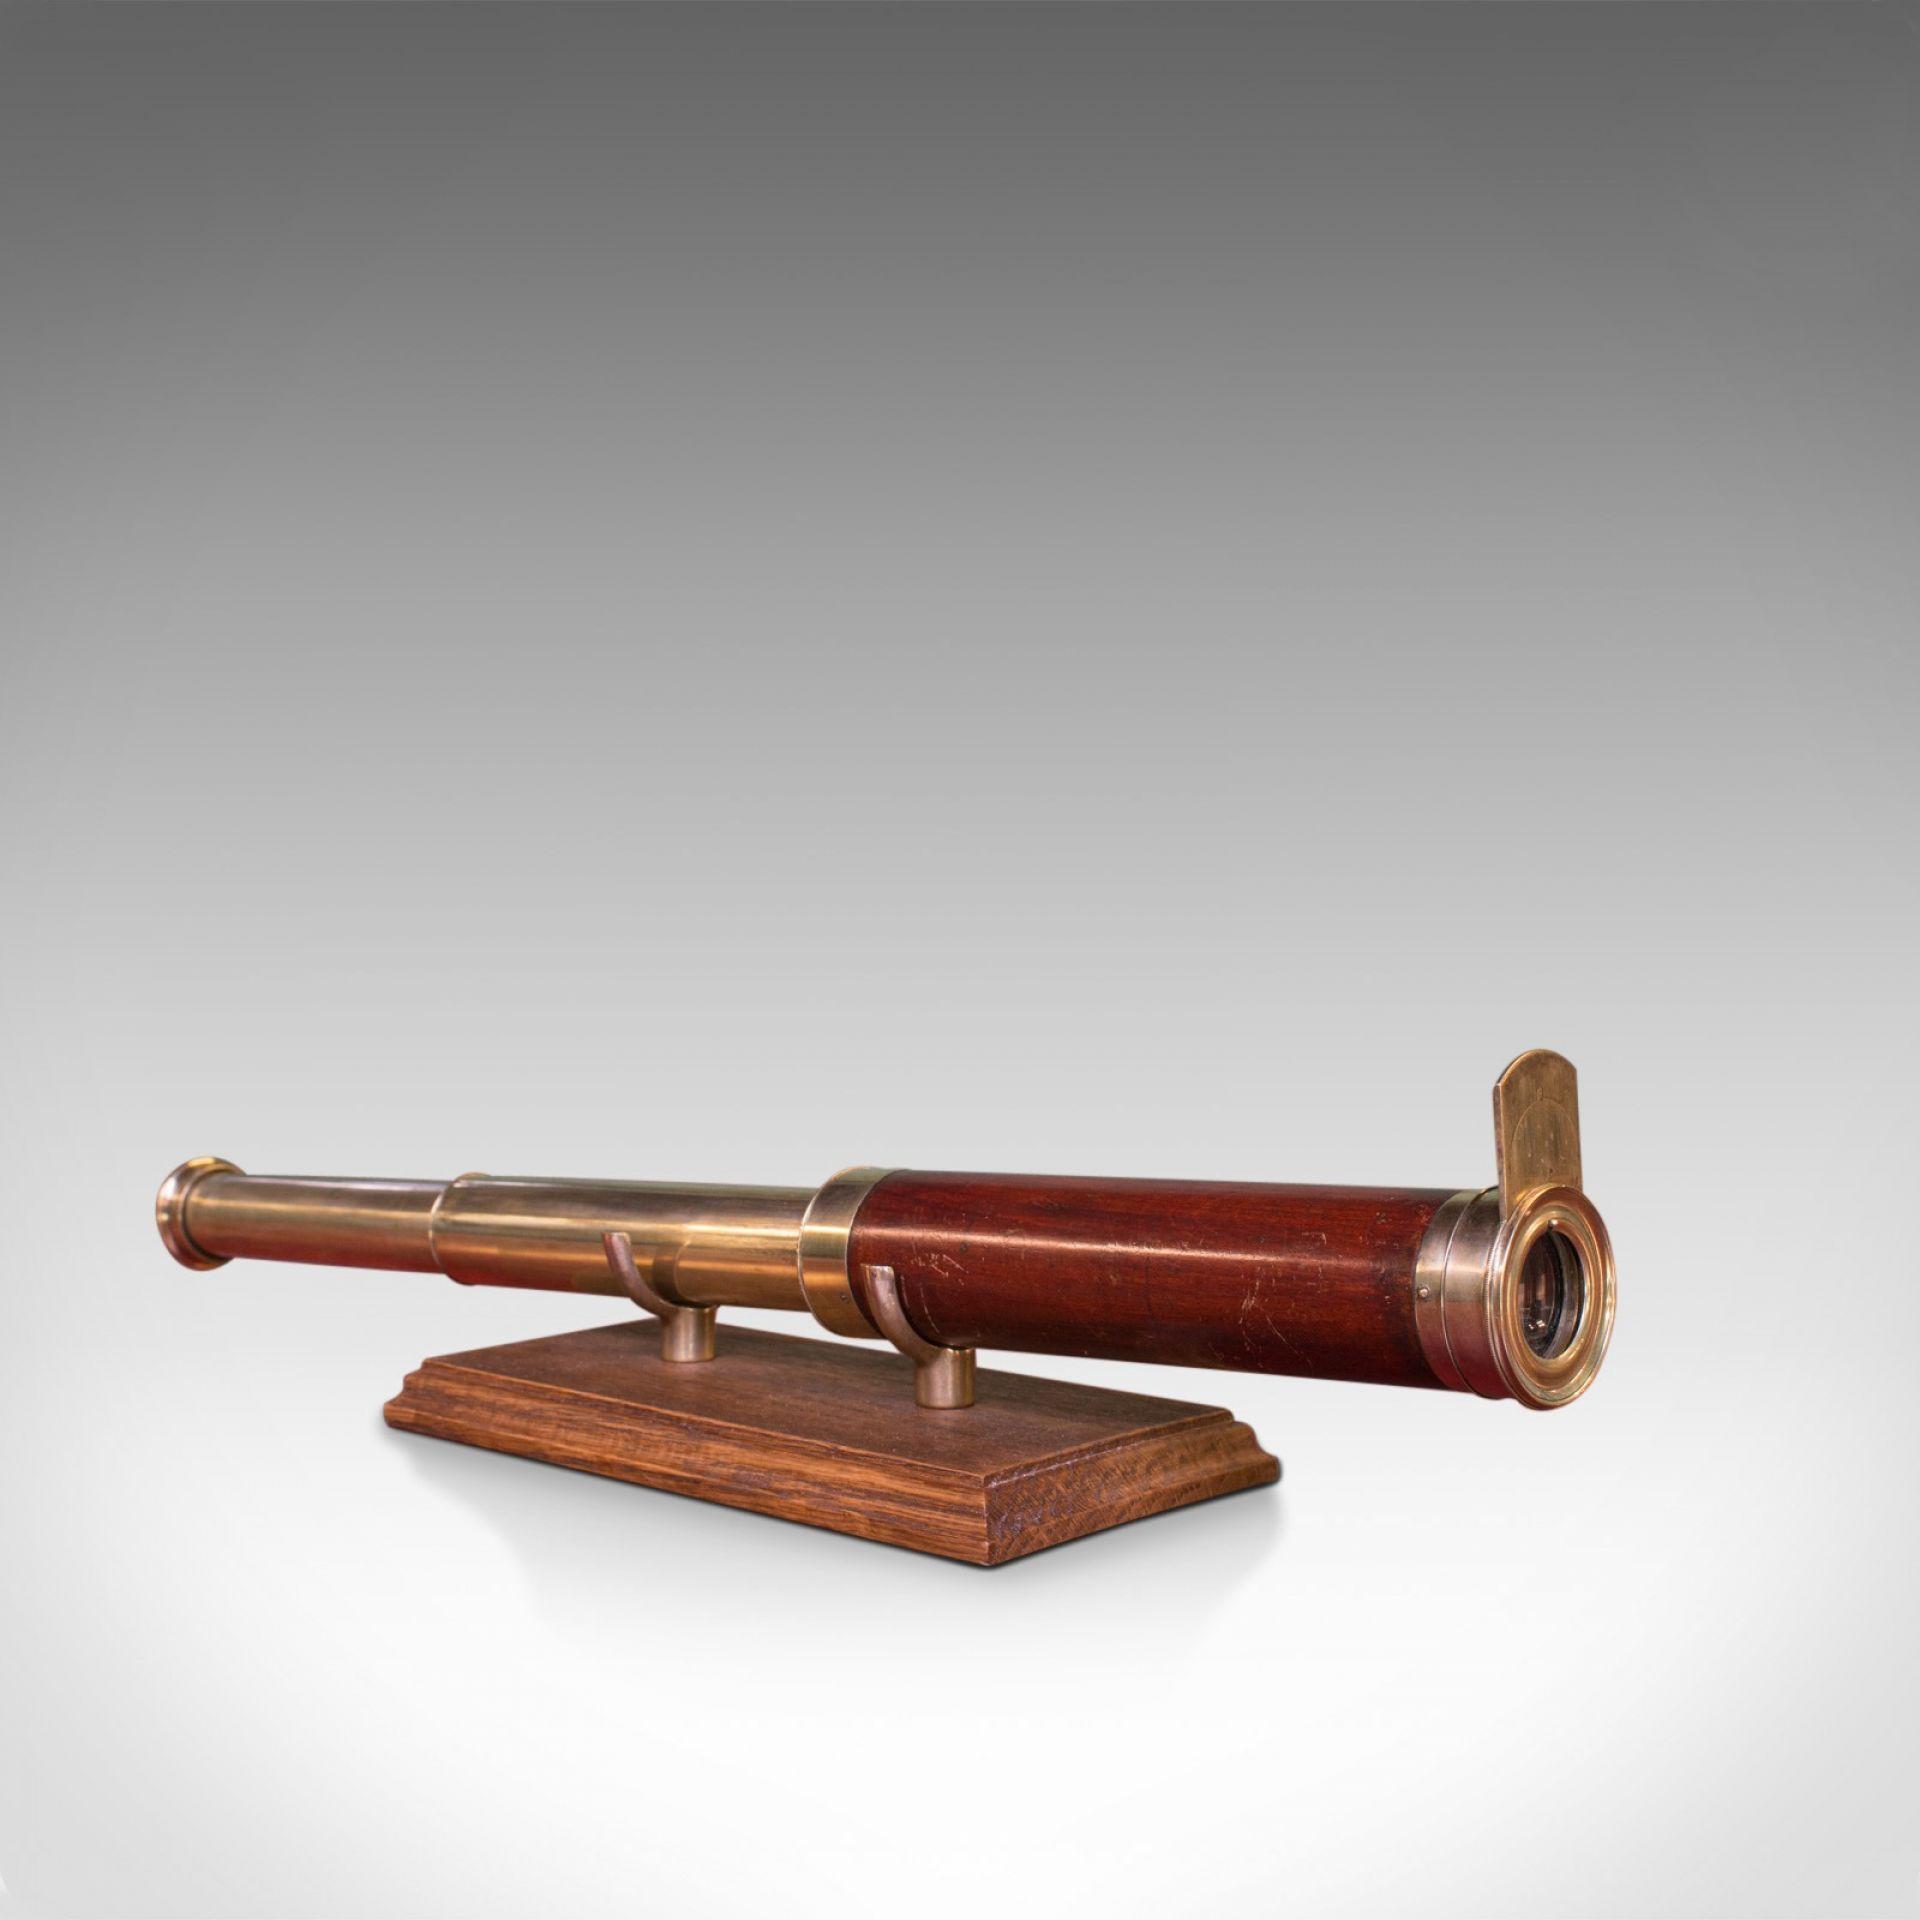 Antique Telescope, 2 Draw Refractor, English, Georgian, 18th Century, Circa 1800